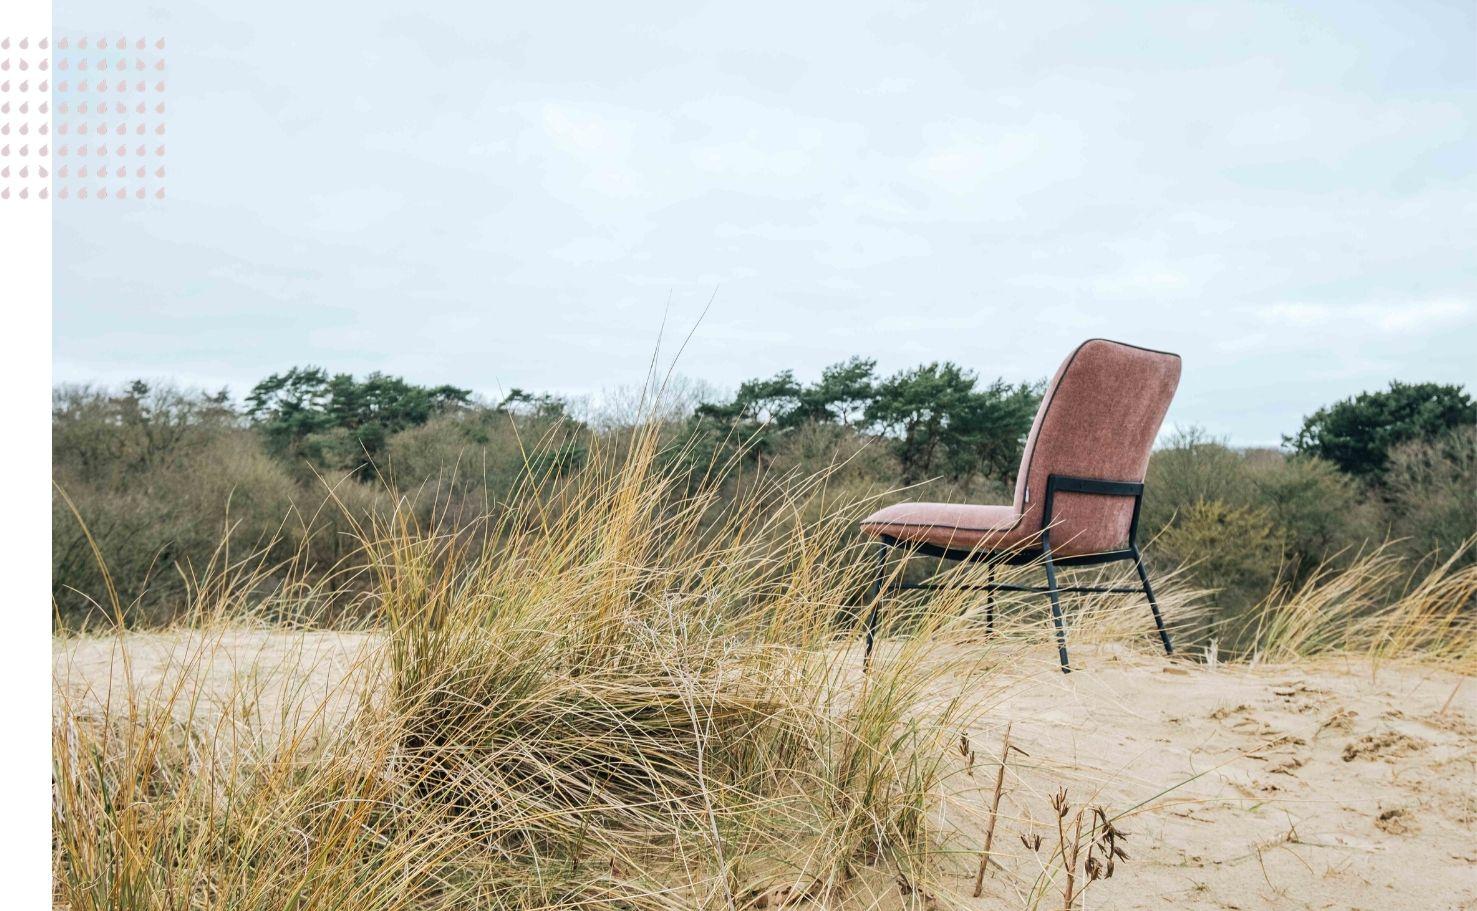 Vanuit de stilte - Ontdek onthaast en herstel - Eendaags retreat in Meijendel - Stilte bezinning en onthaasting